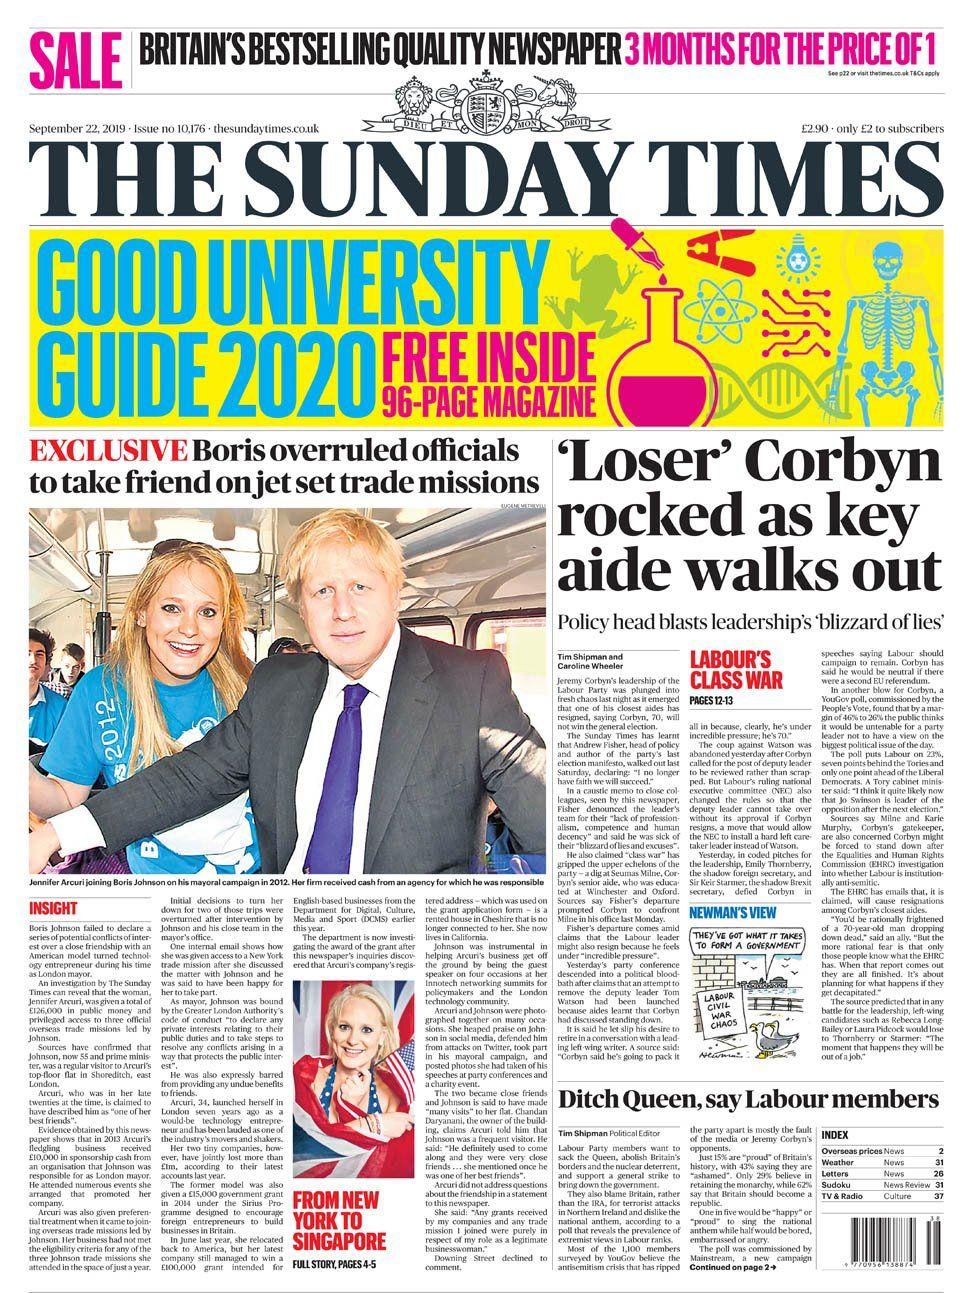 Newspaper headlines: Jeremy Corbyn's key aide Andrew Fisher 'walks out'